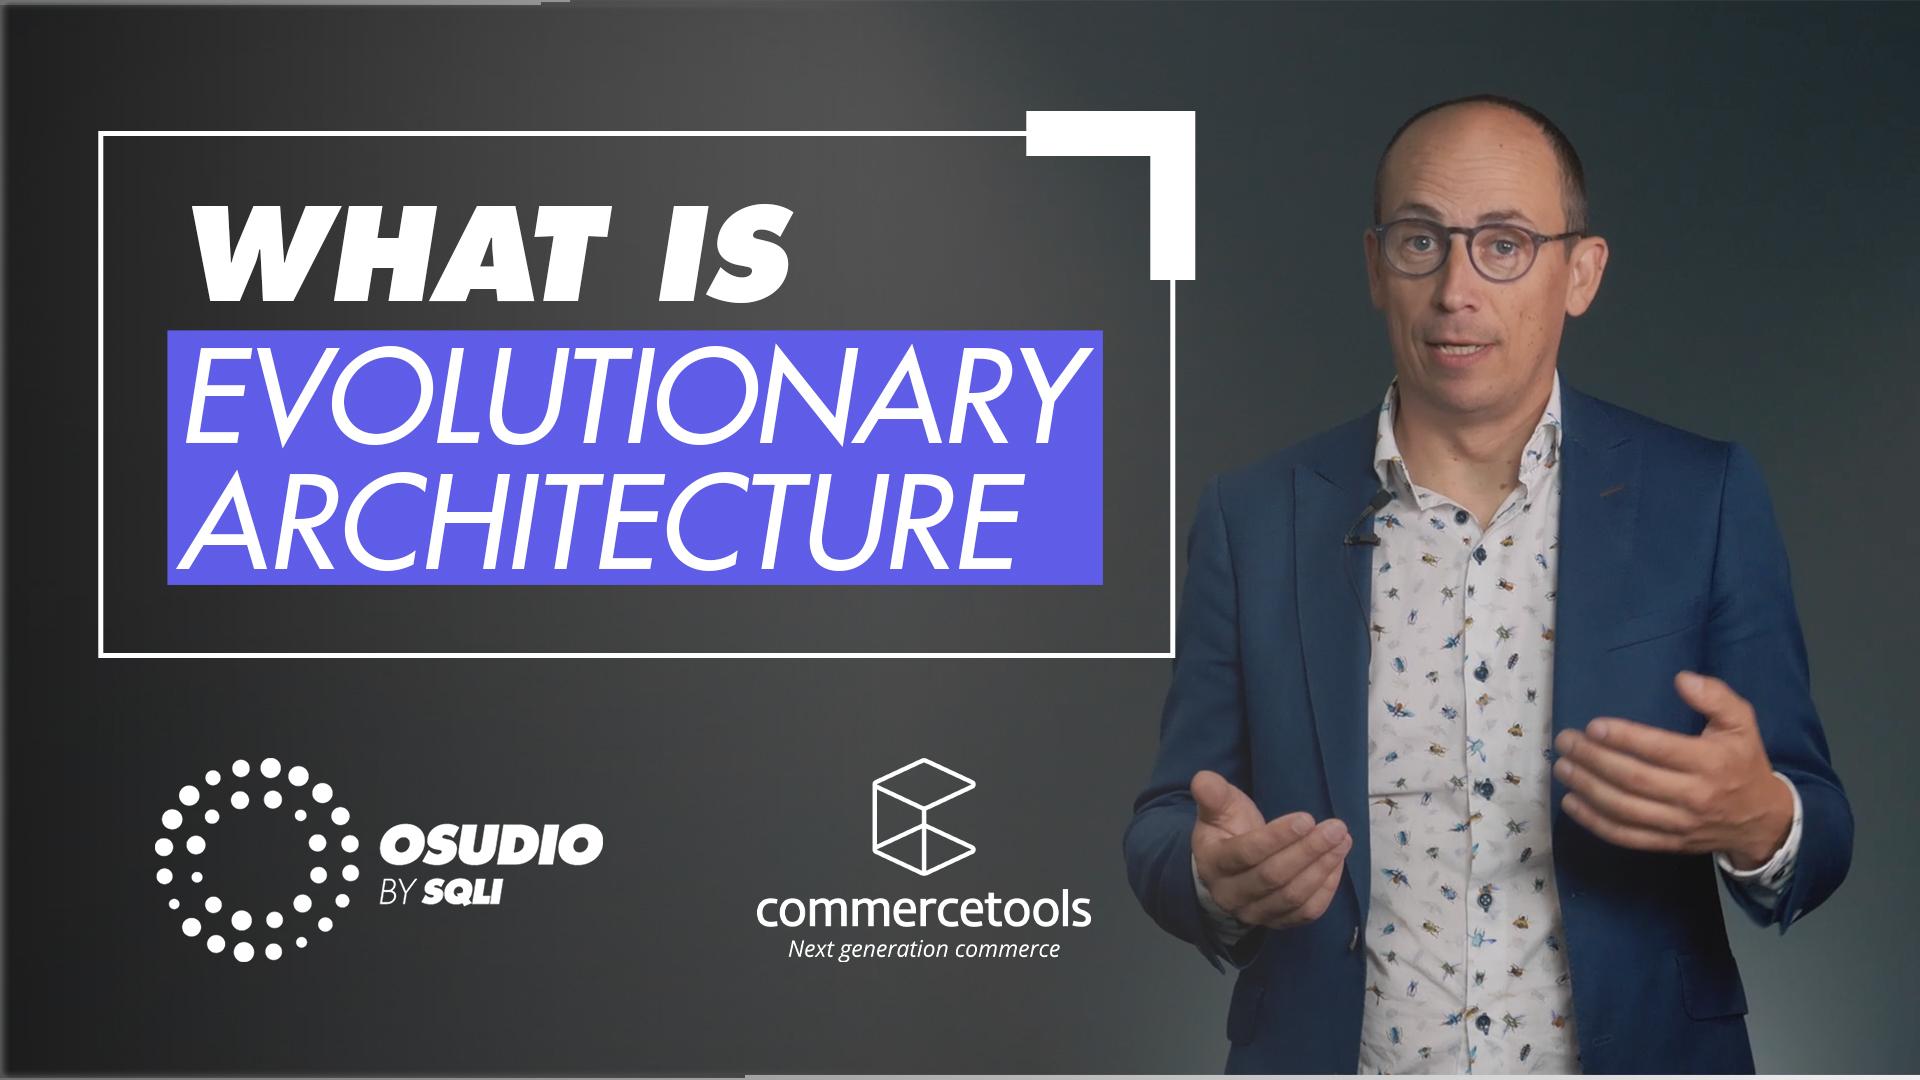 201910_osudio_ALL_video_commerce_tools_evolutionary_architecture_V06_1-sound_fix